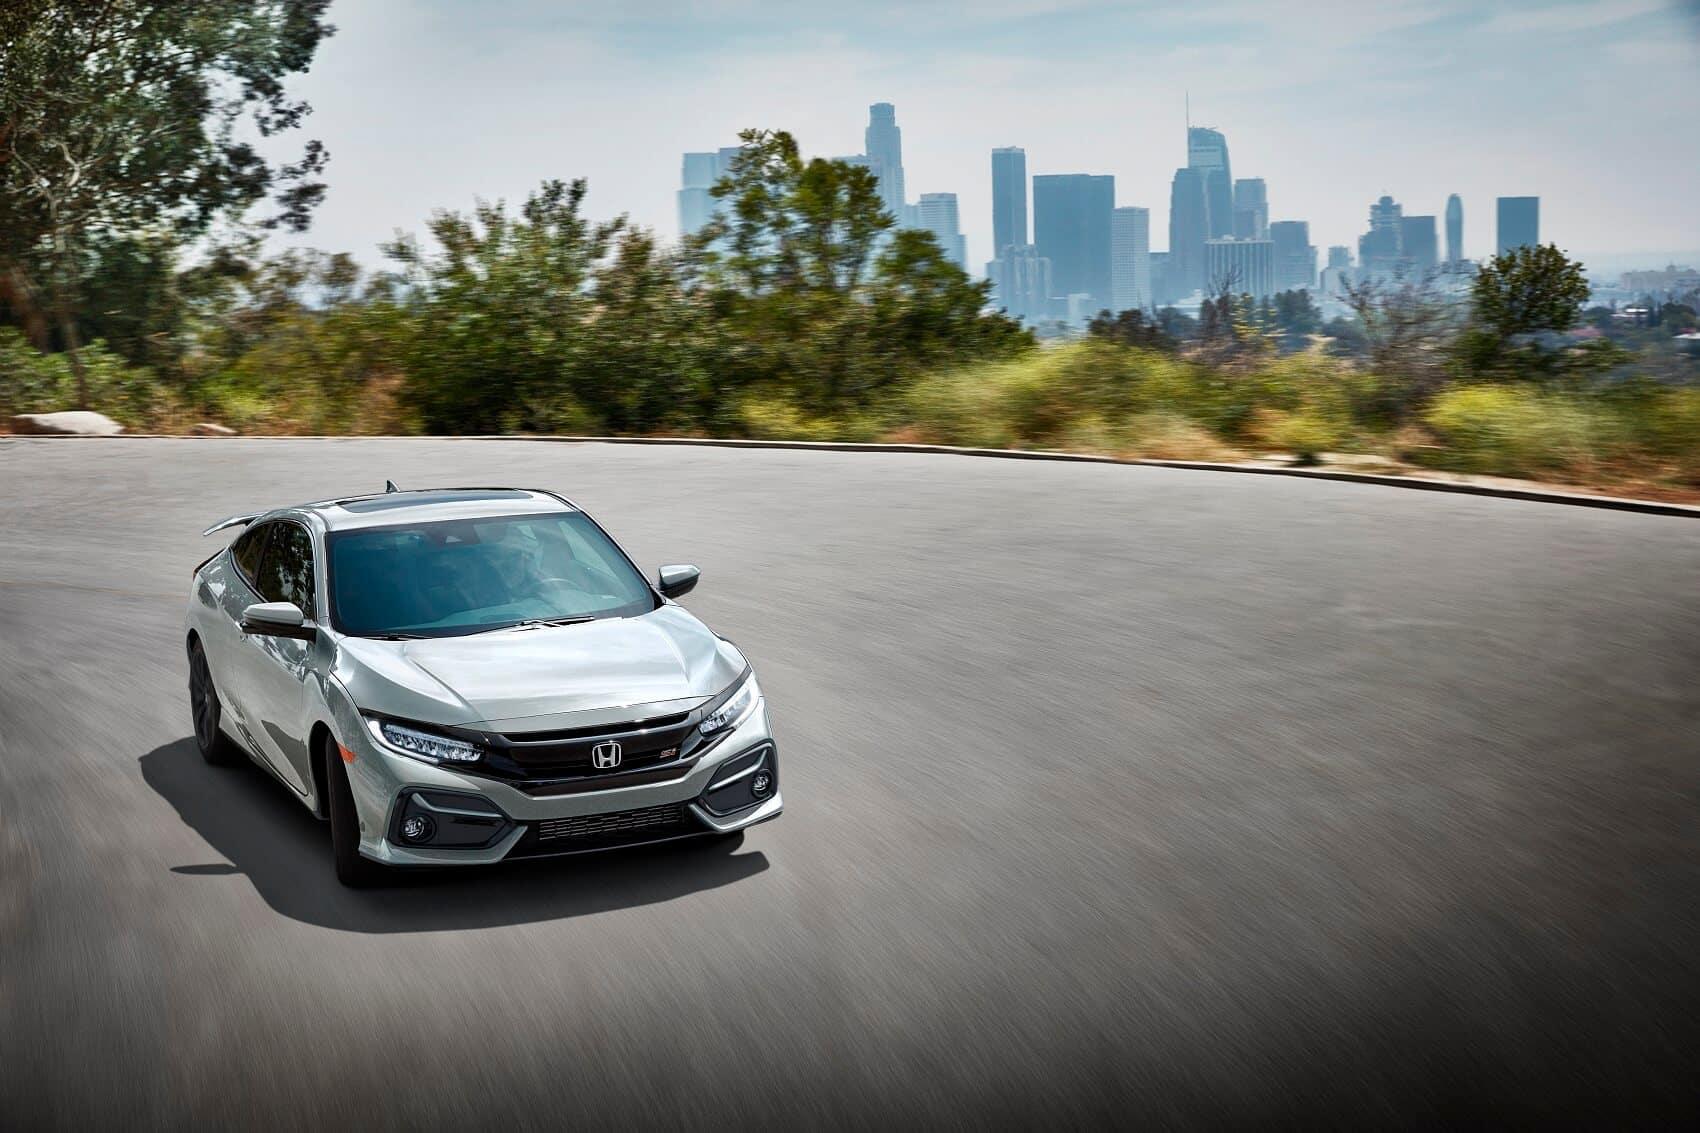 Honda Civic vs Kia K5 Fuel Efficiency